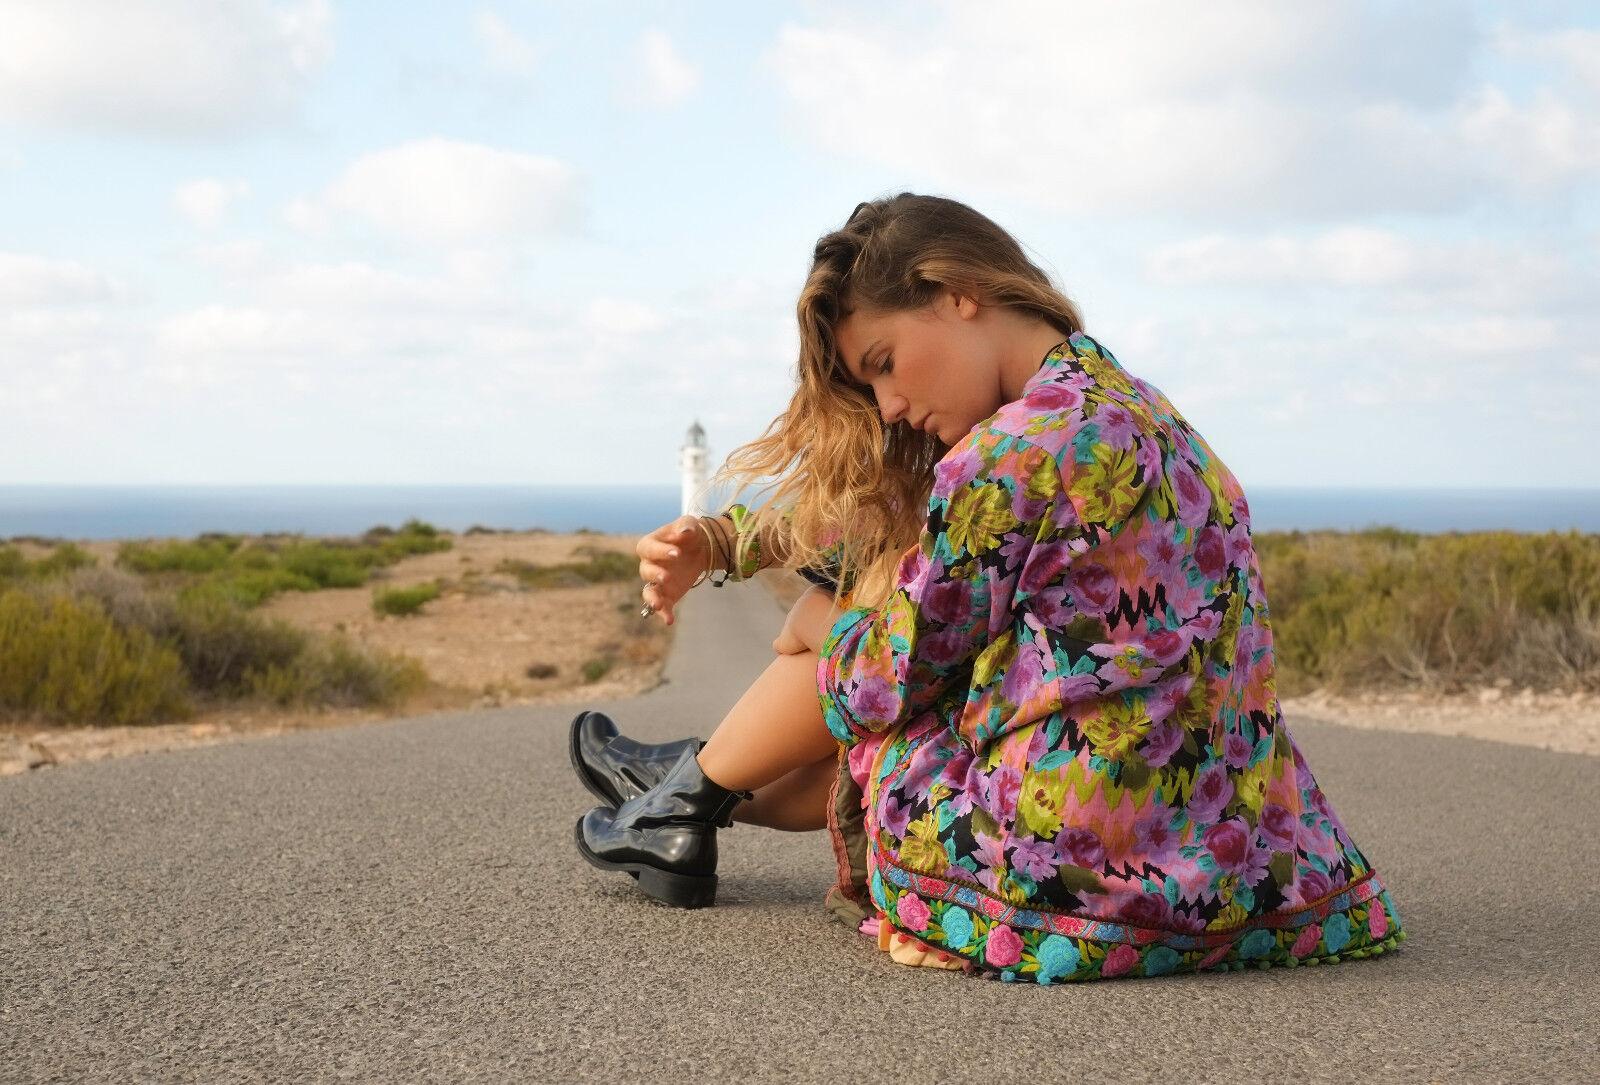 Woman vegan ankle Stiefel closurot with schwarz zipper zipper zipper at the front ecological 0b2aaa